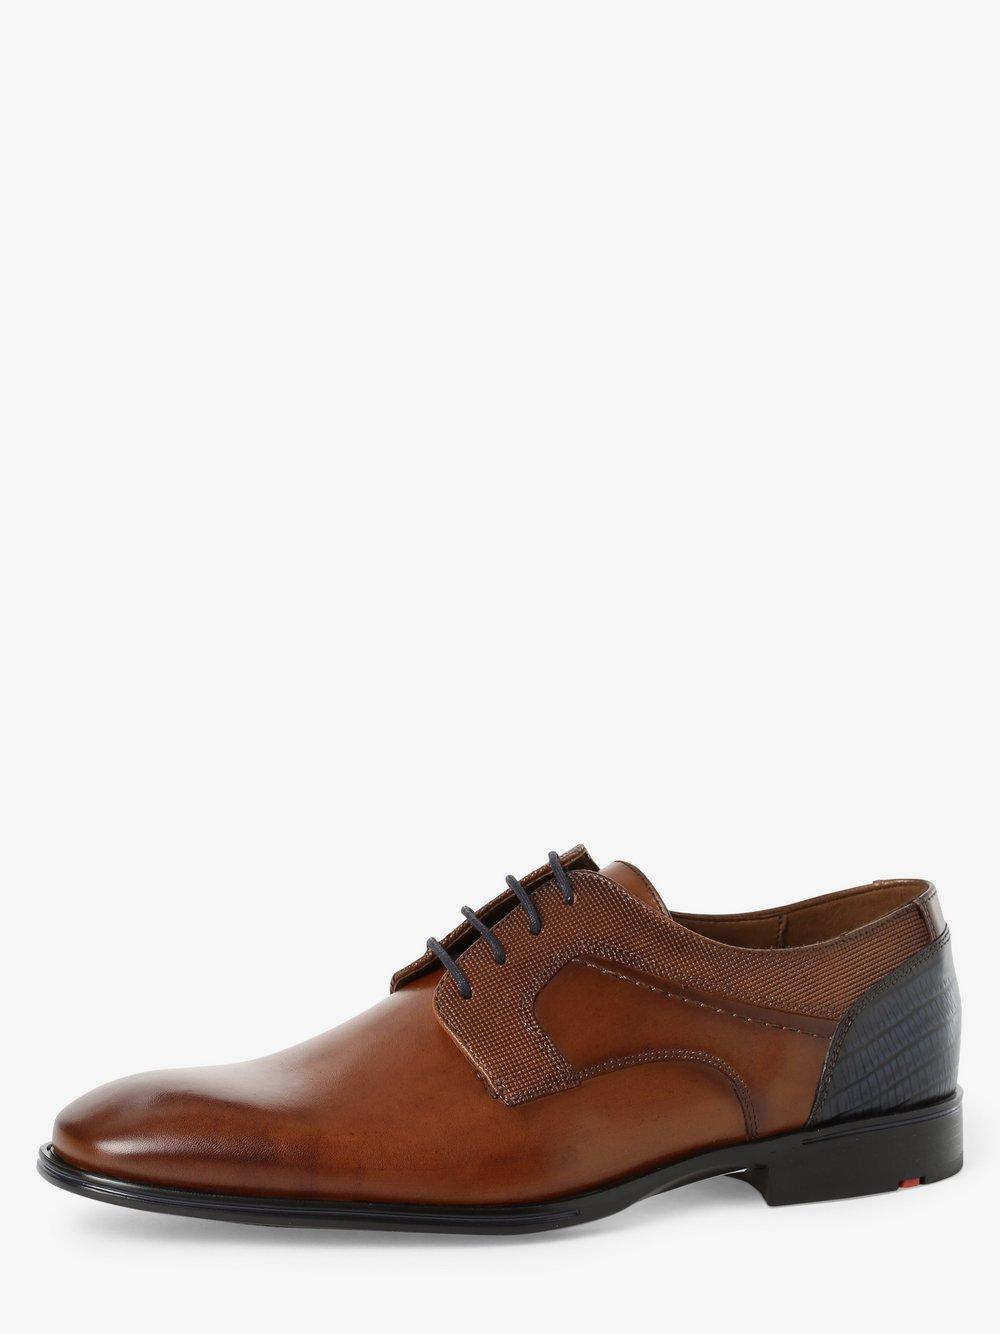 Lloyd – Męskie buty sznurowane ze skóry – Gilbert, beżowy Van Graaf 488005-0001-00090